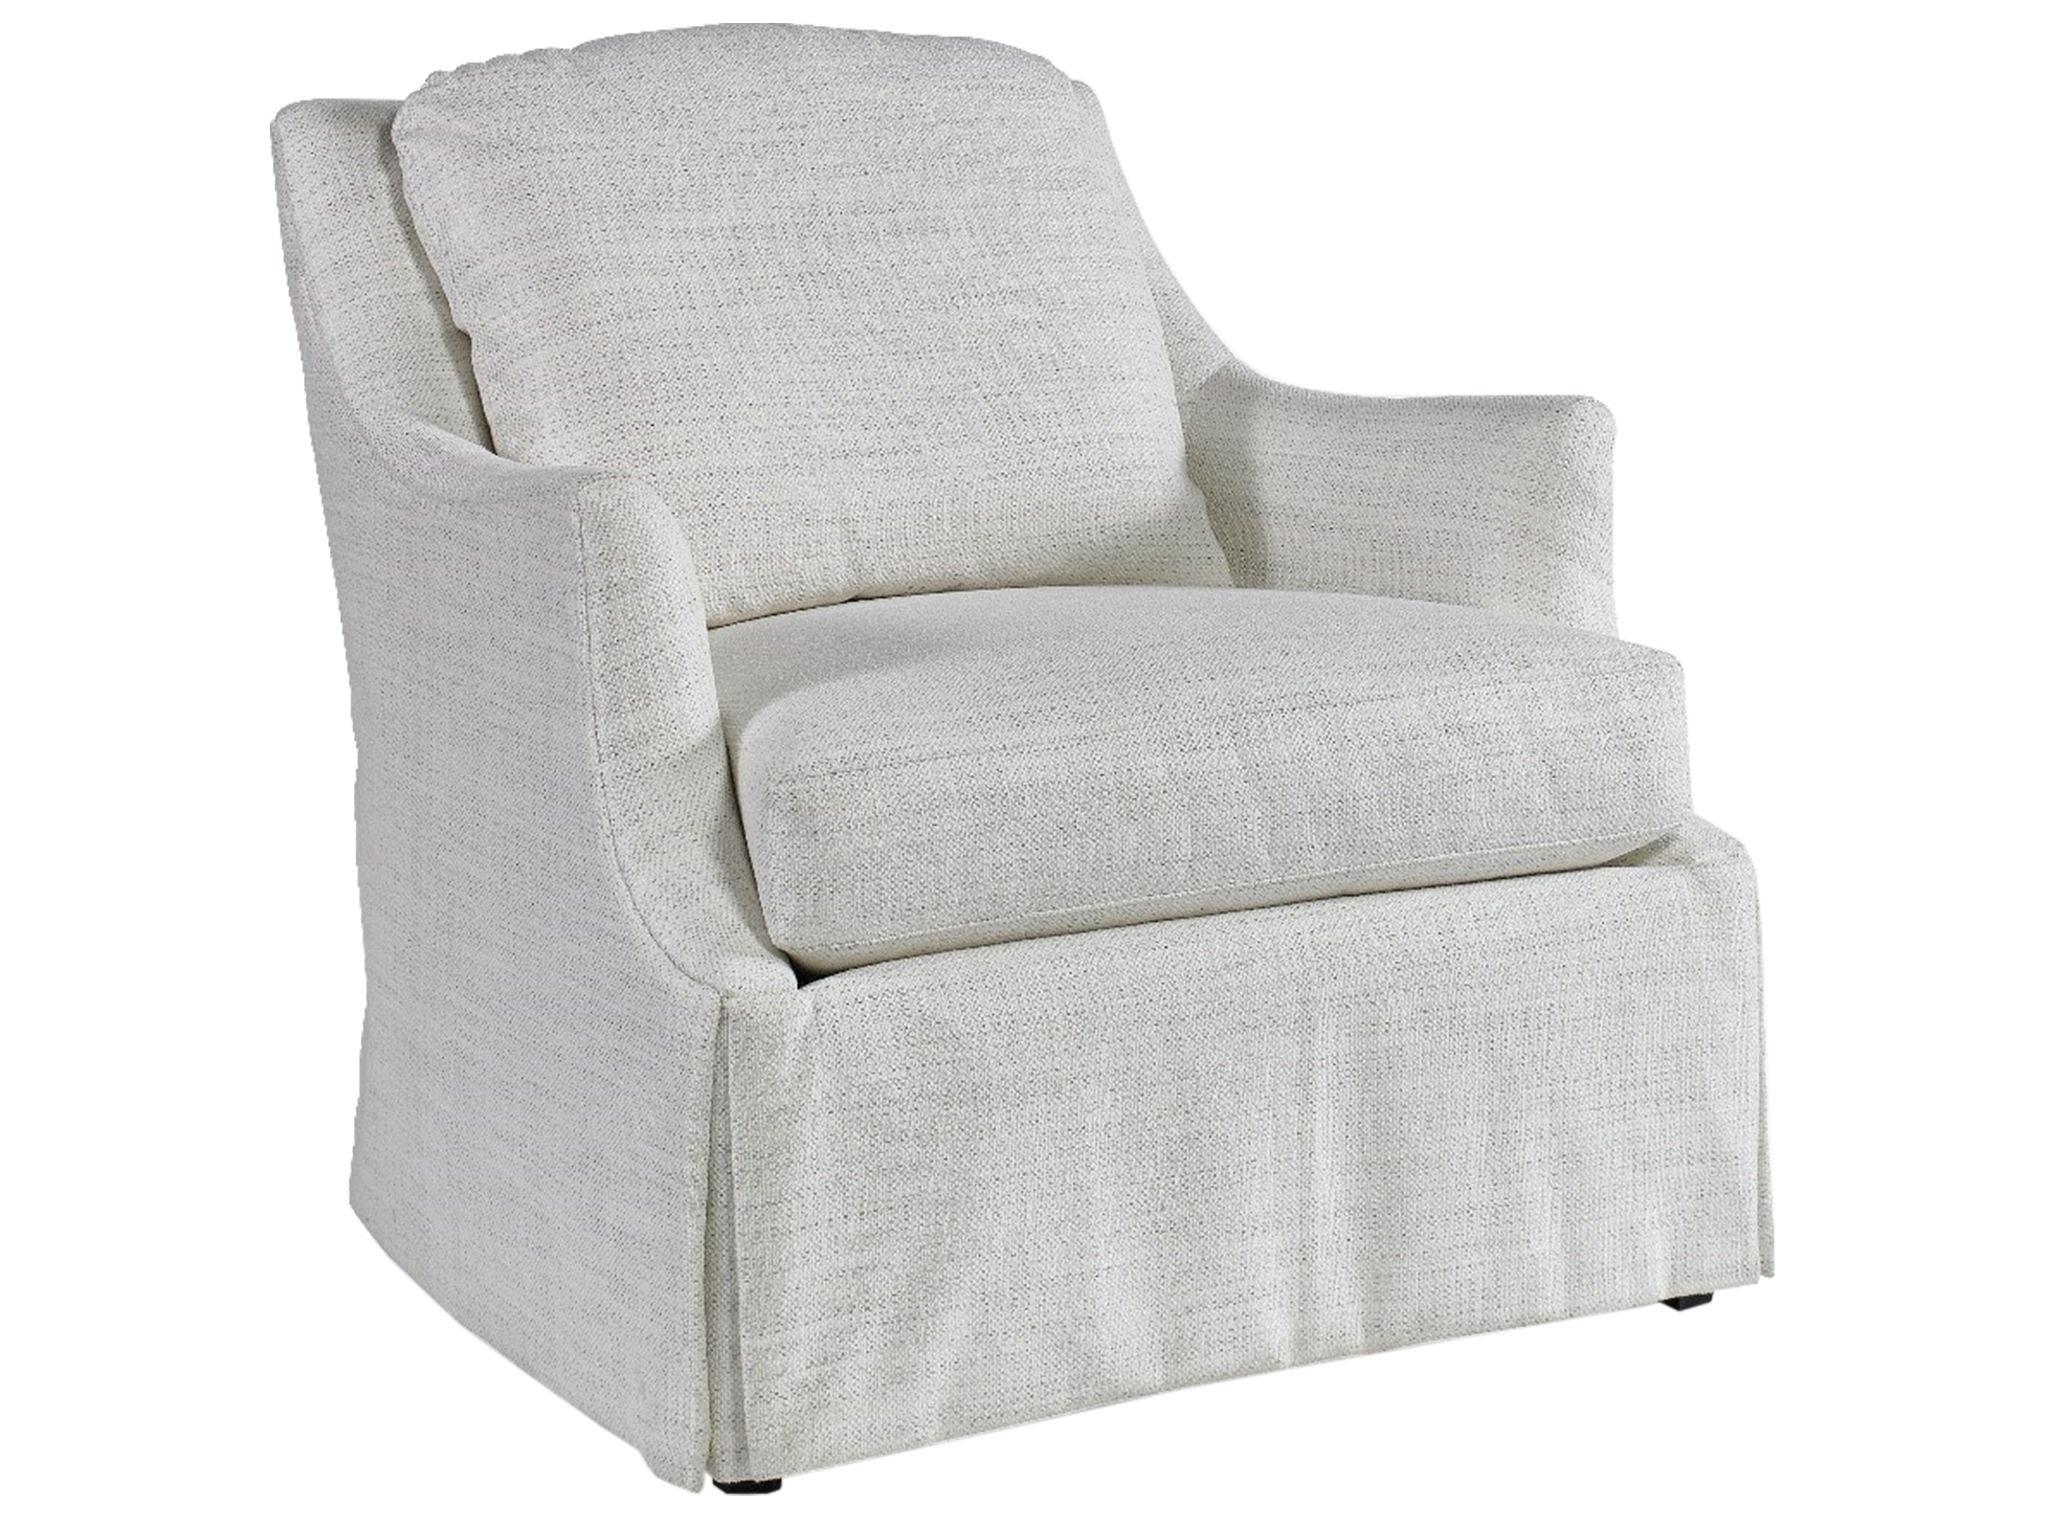 Sherrill Chair 1719